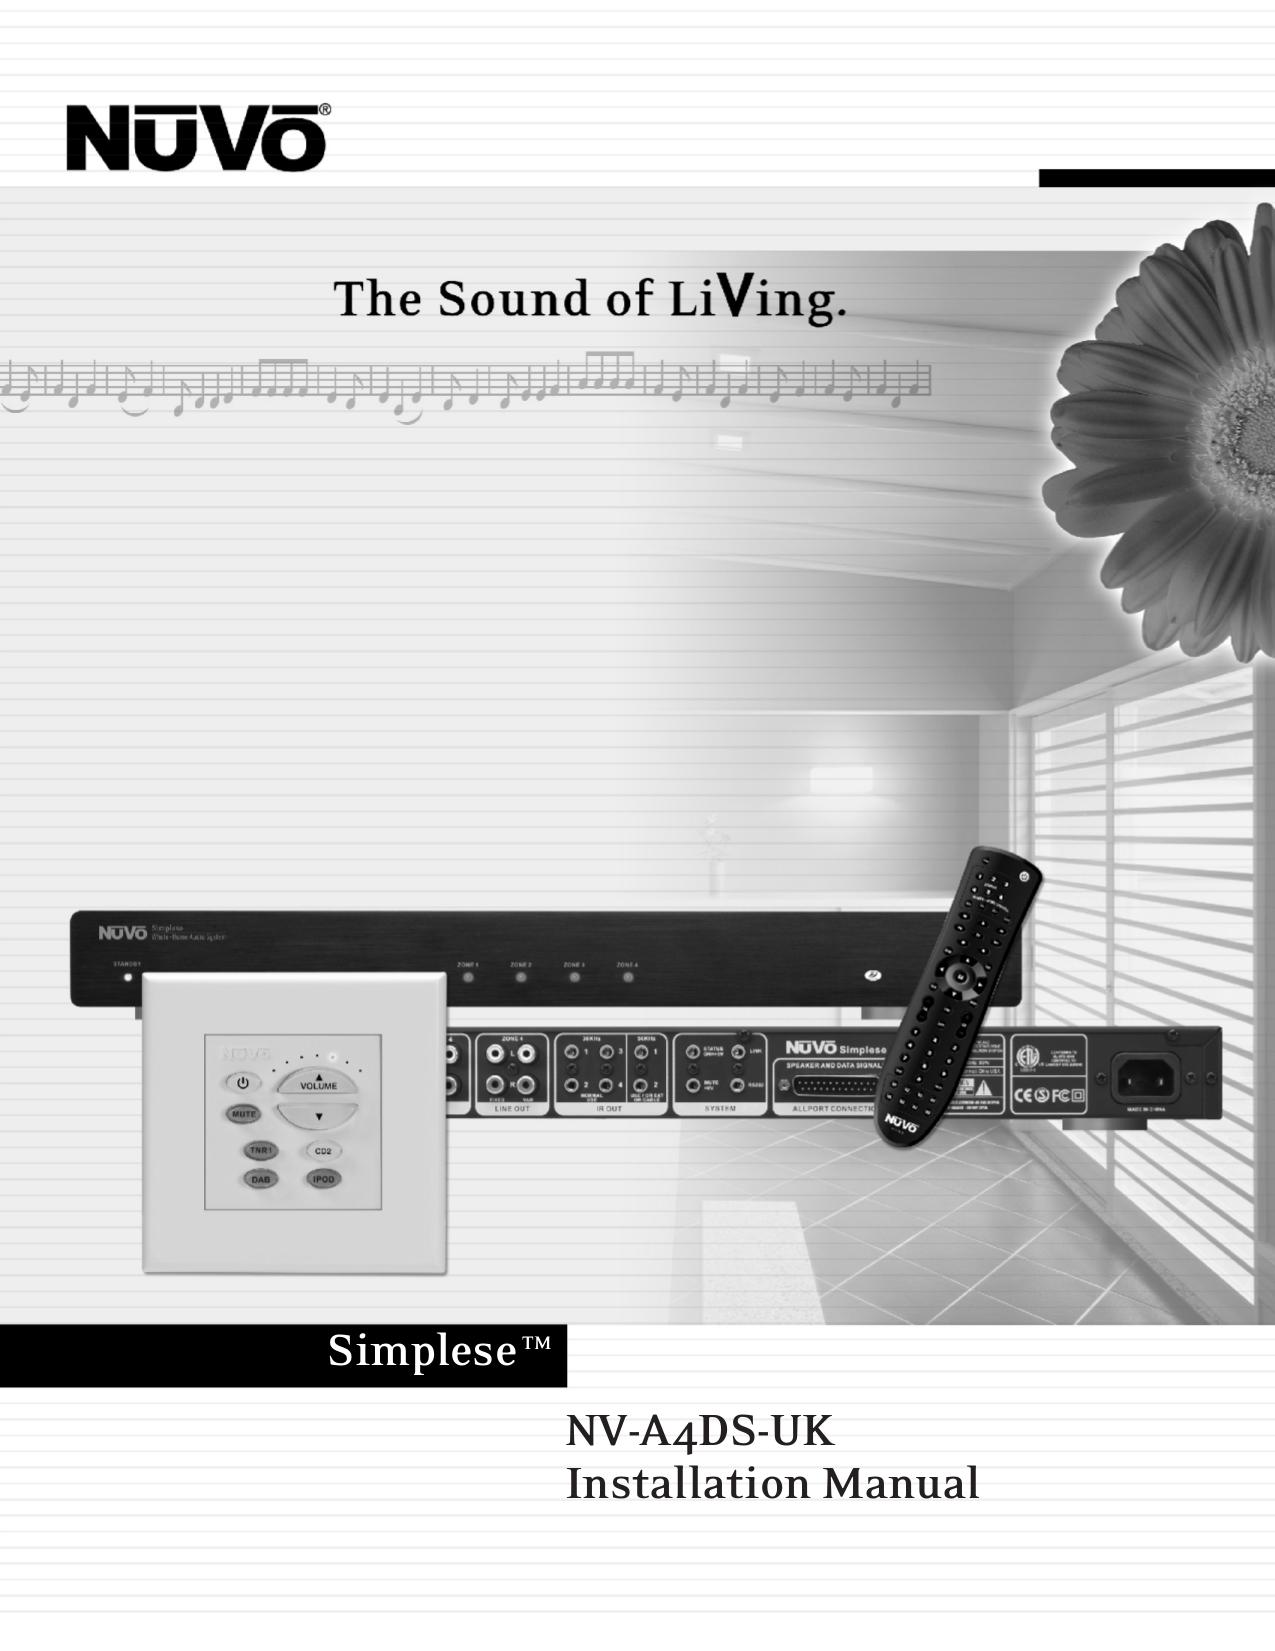 NVA4D UK_installation_manual.pdf 0 download free pdf for nuvo nv p2100 amp manual nuvo simplese wiring diagram at eliteediting.co